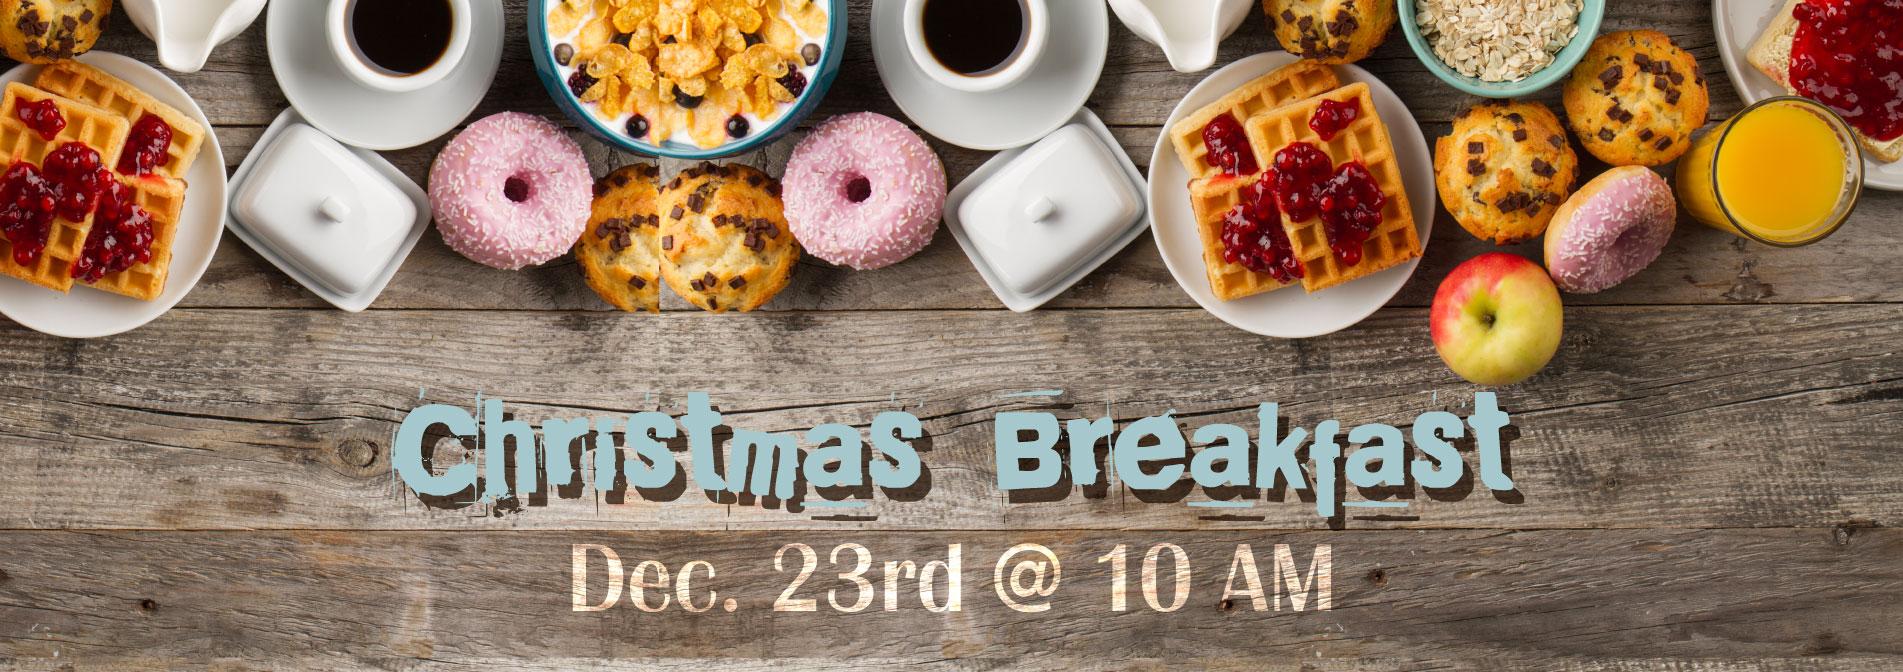 Christmas breakfast 2018